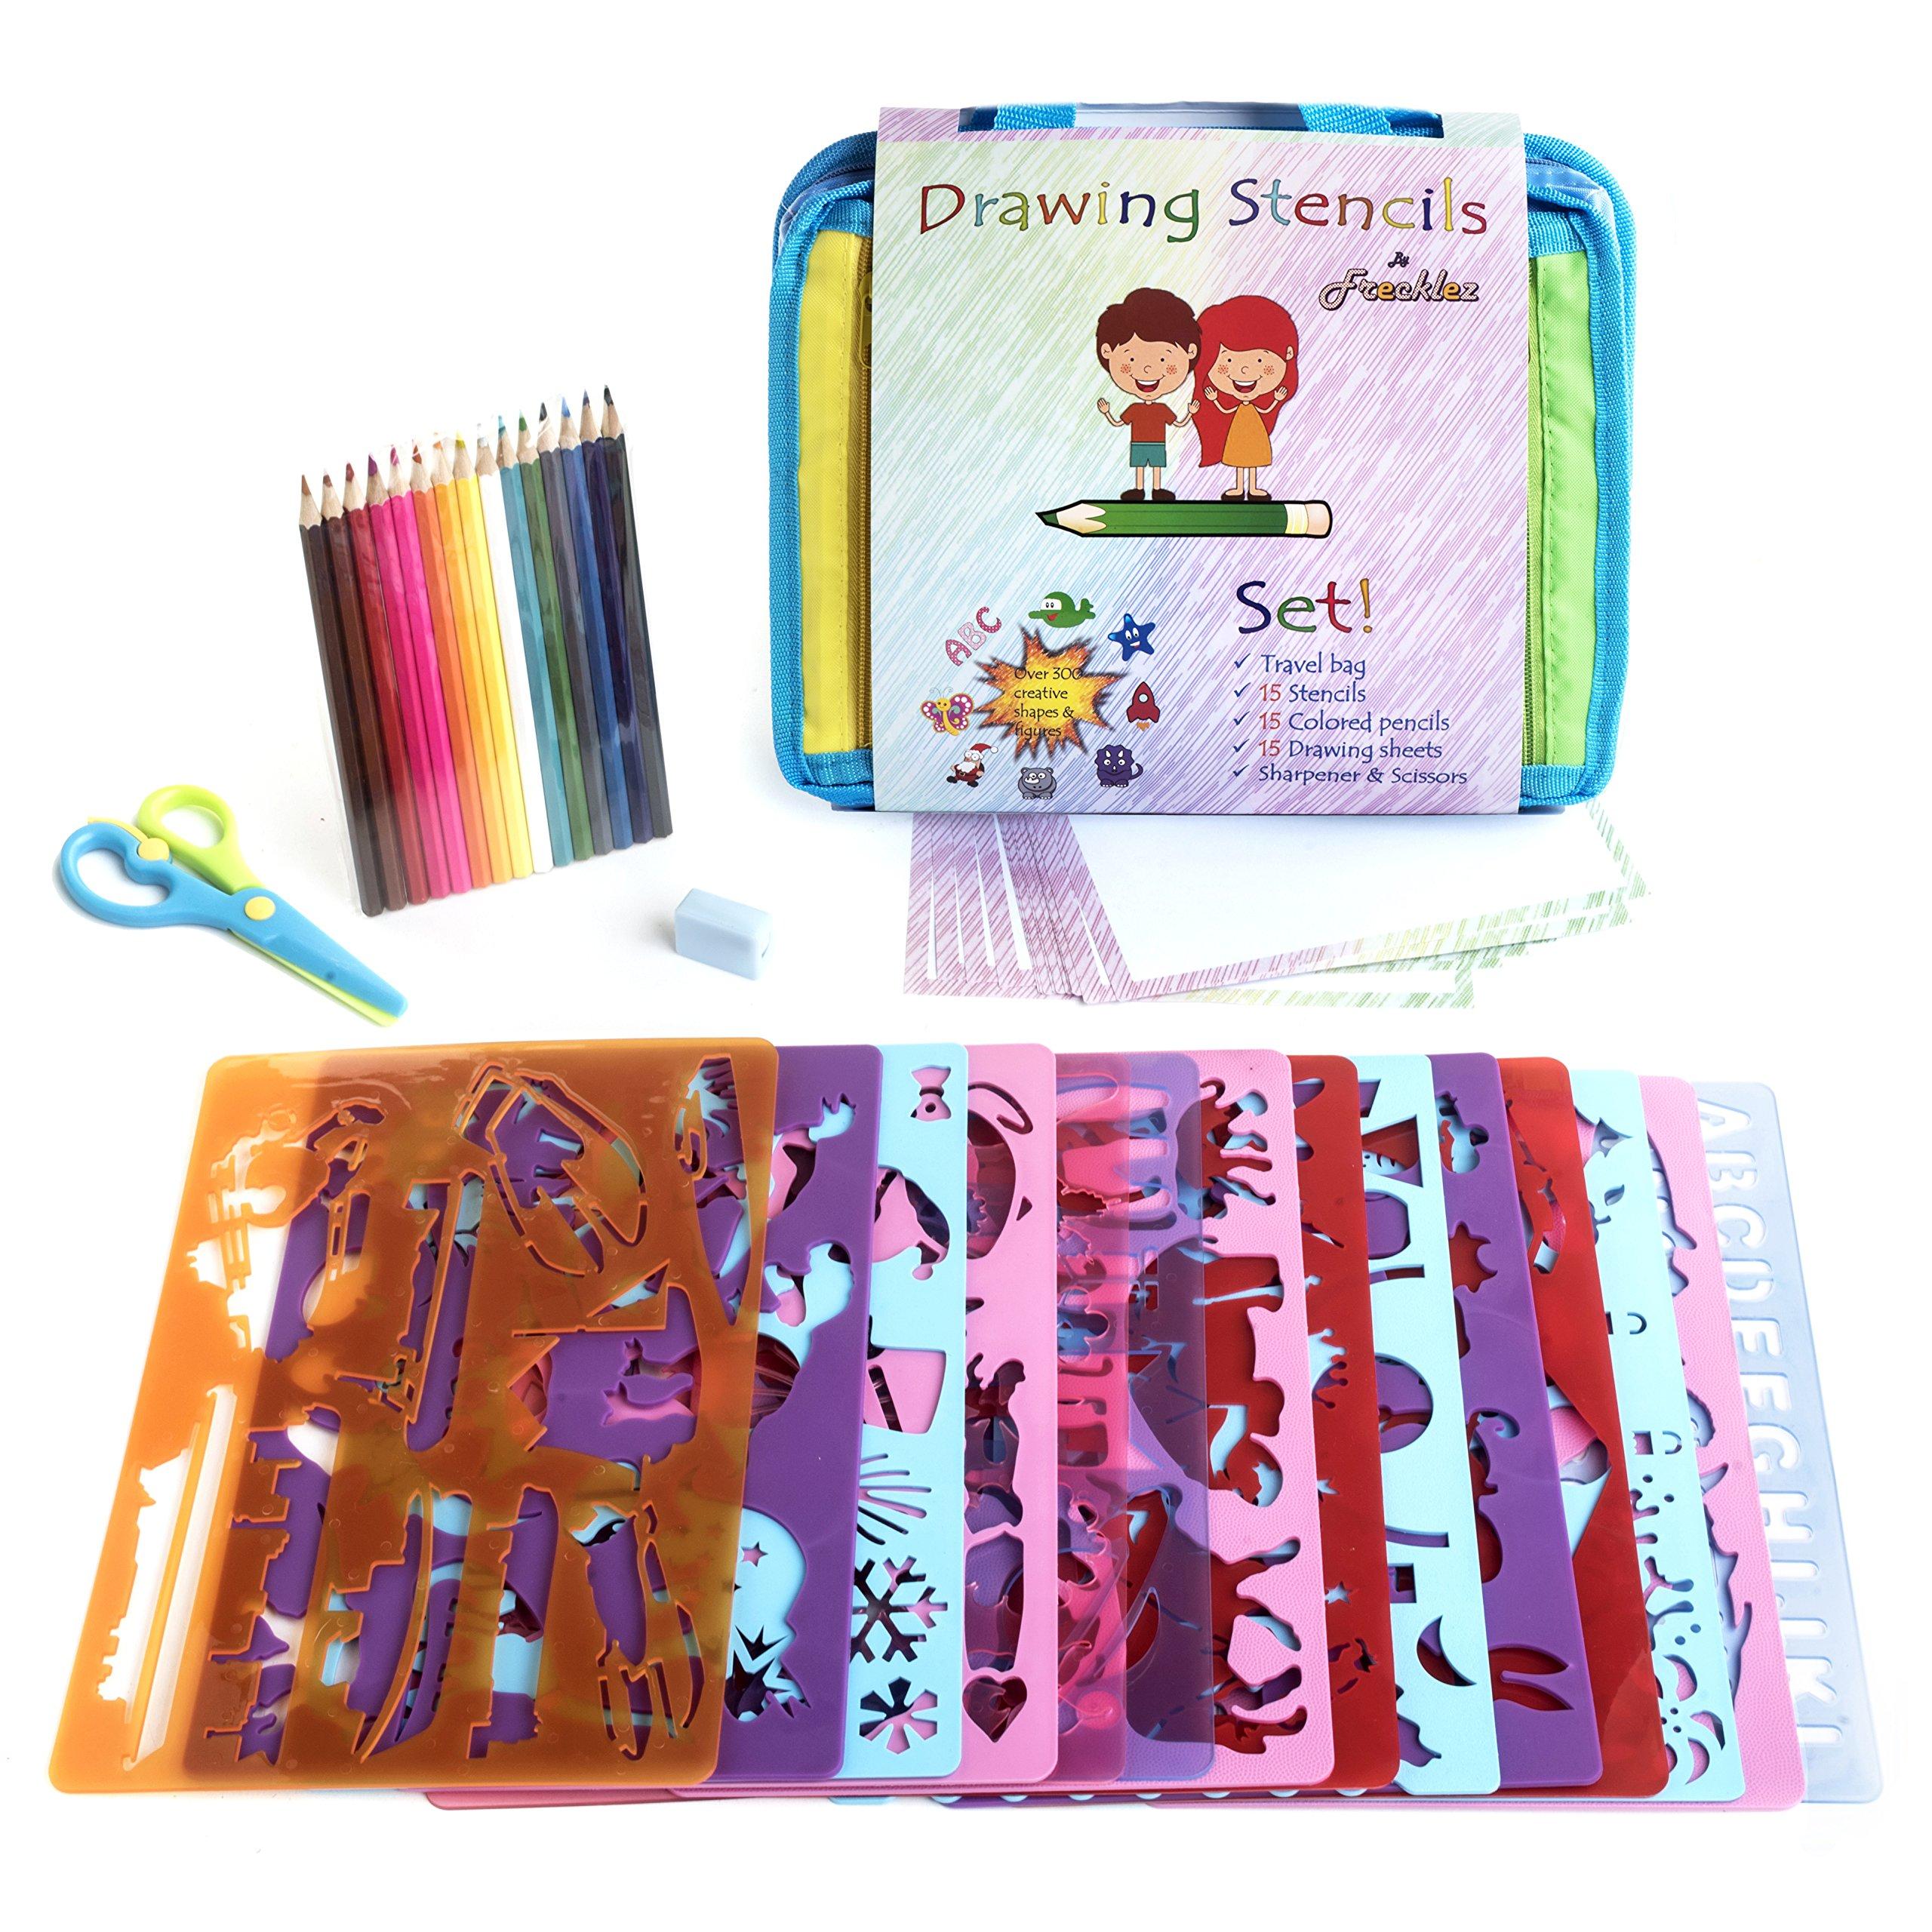 Frecklez stencil set stencil kit for kids fabric travel bag with